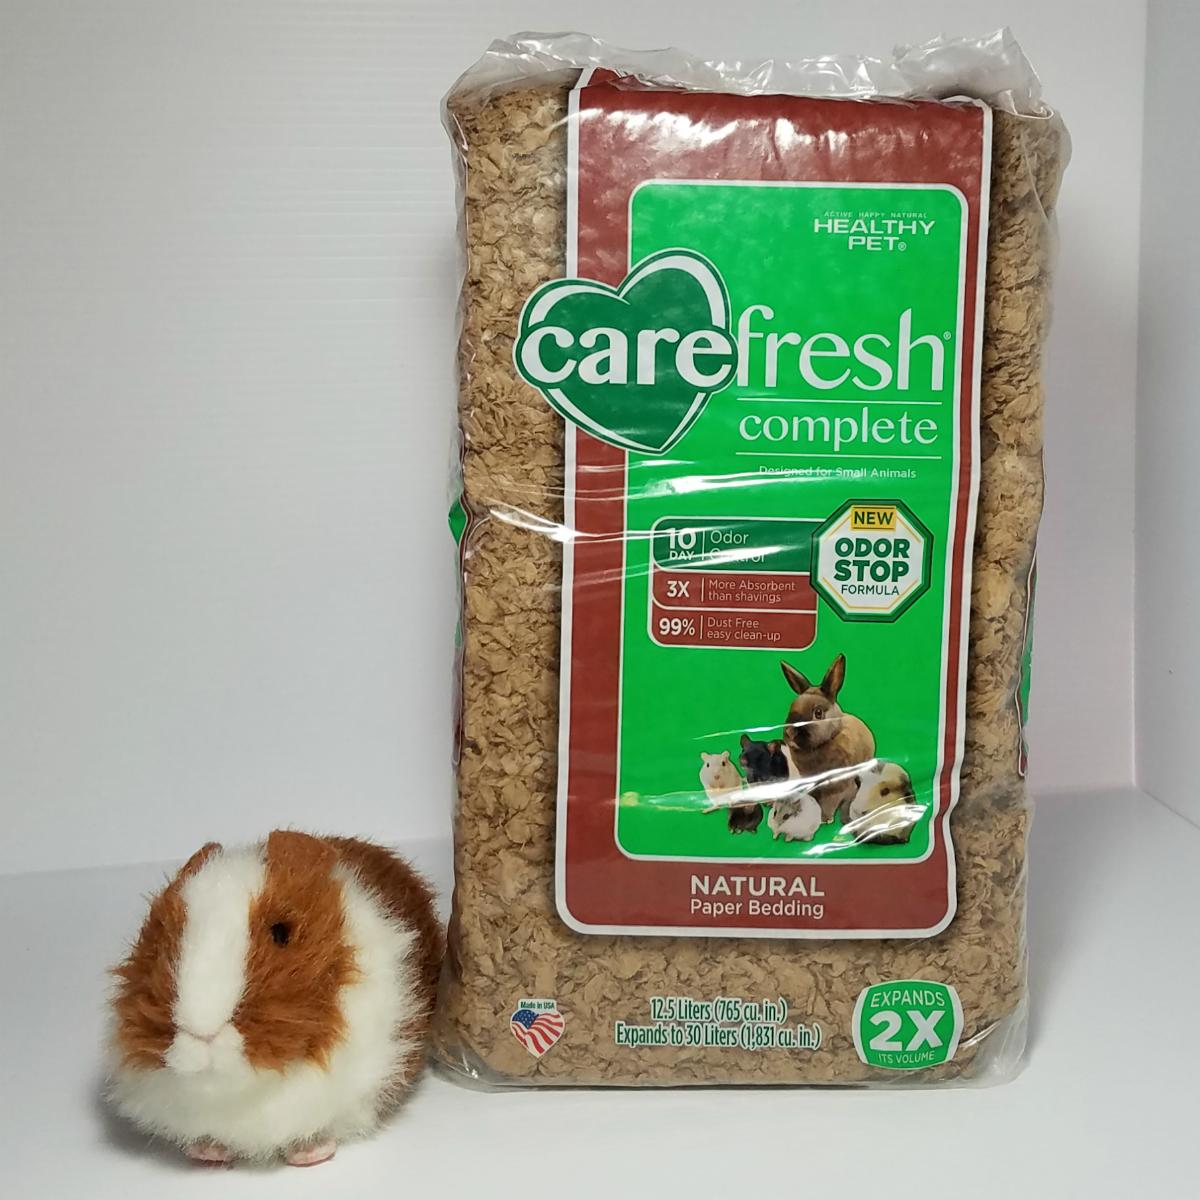 Carefresh Natural Premium Disposable Litter